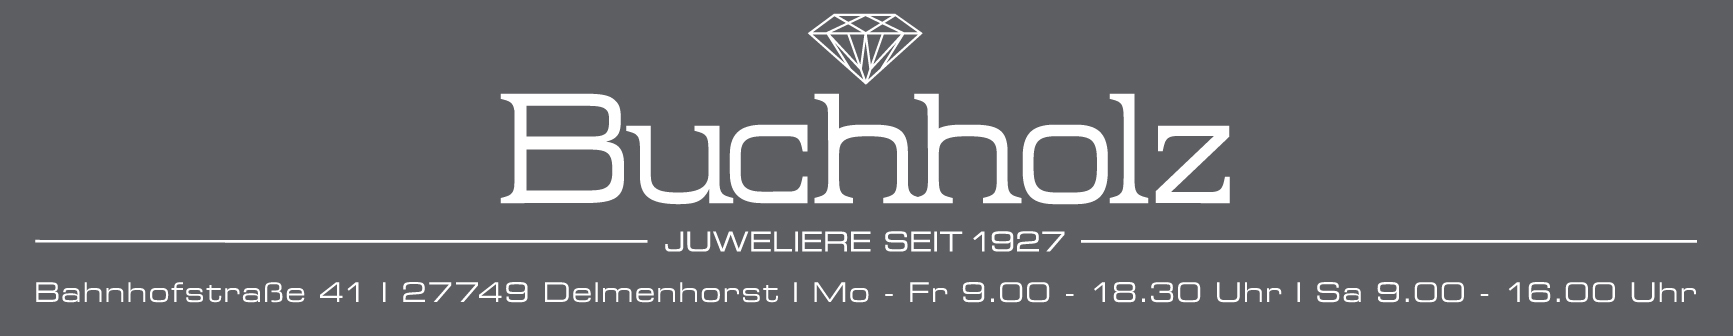 Juwelier Buchholz